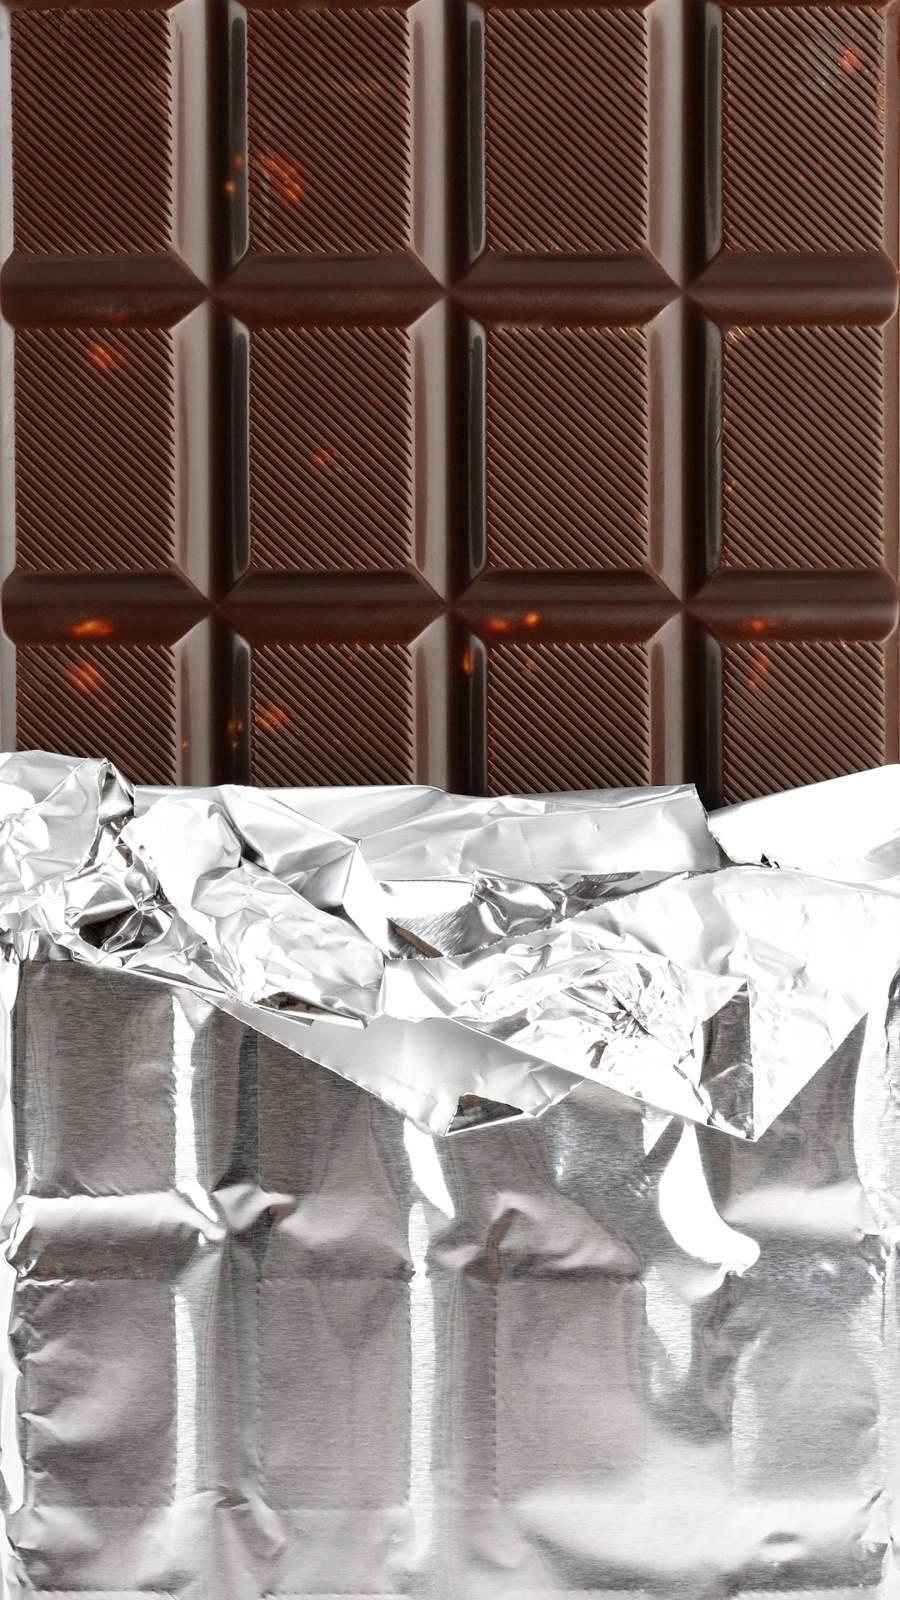 Chocolate Bar iPhone Wallpaper